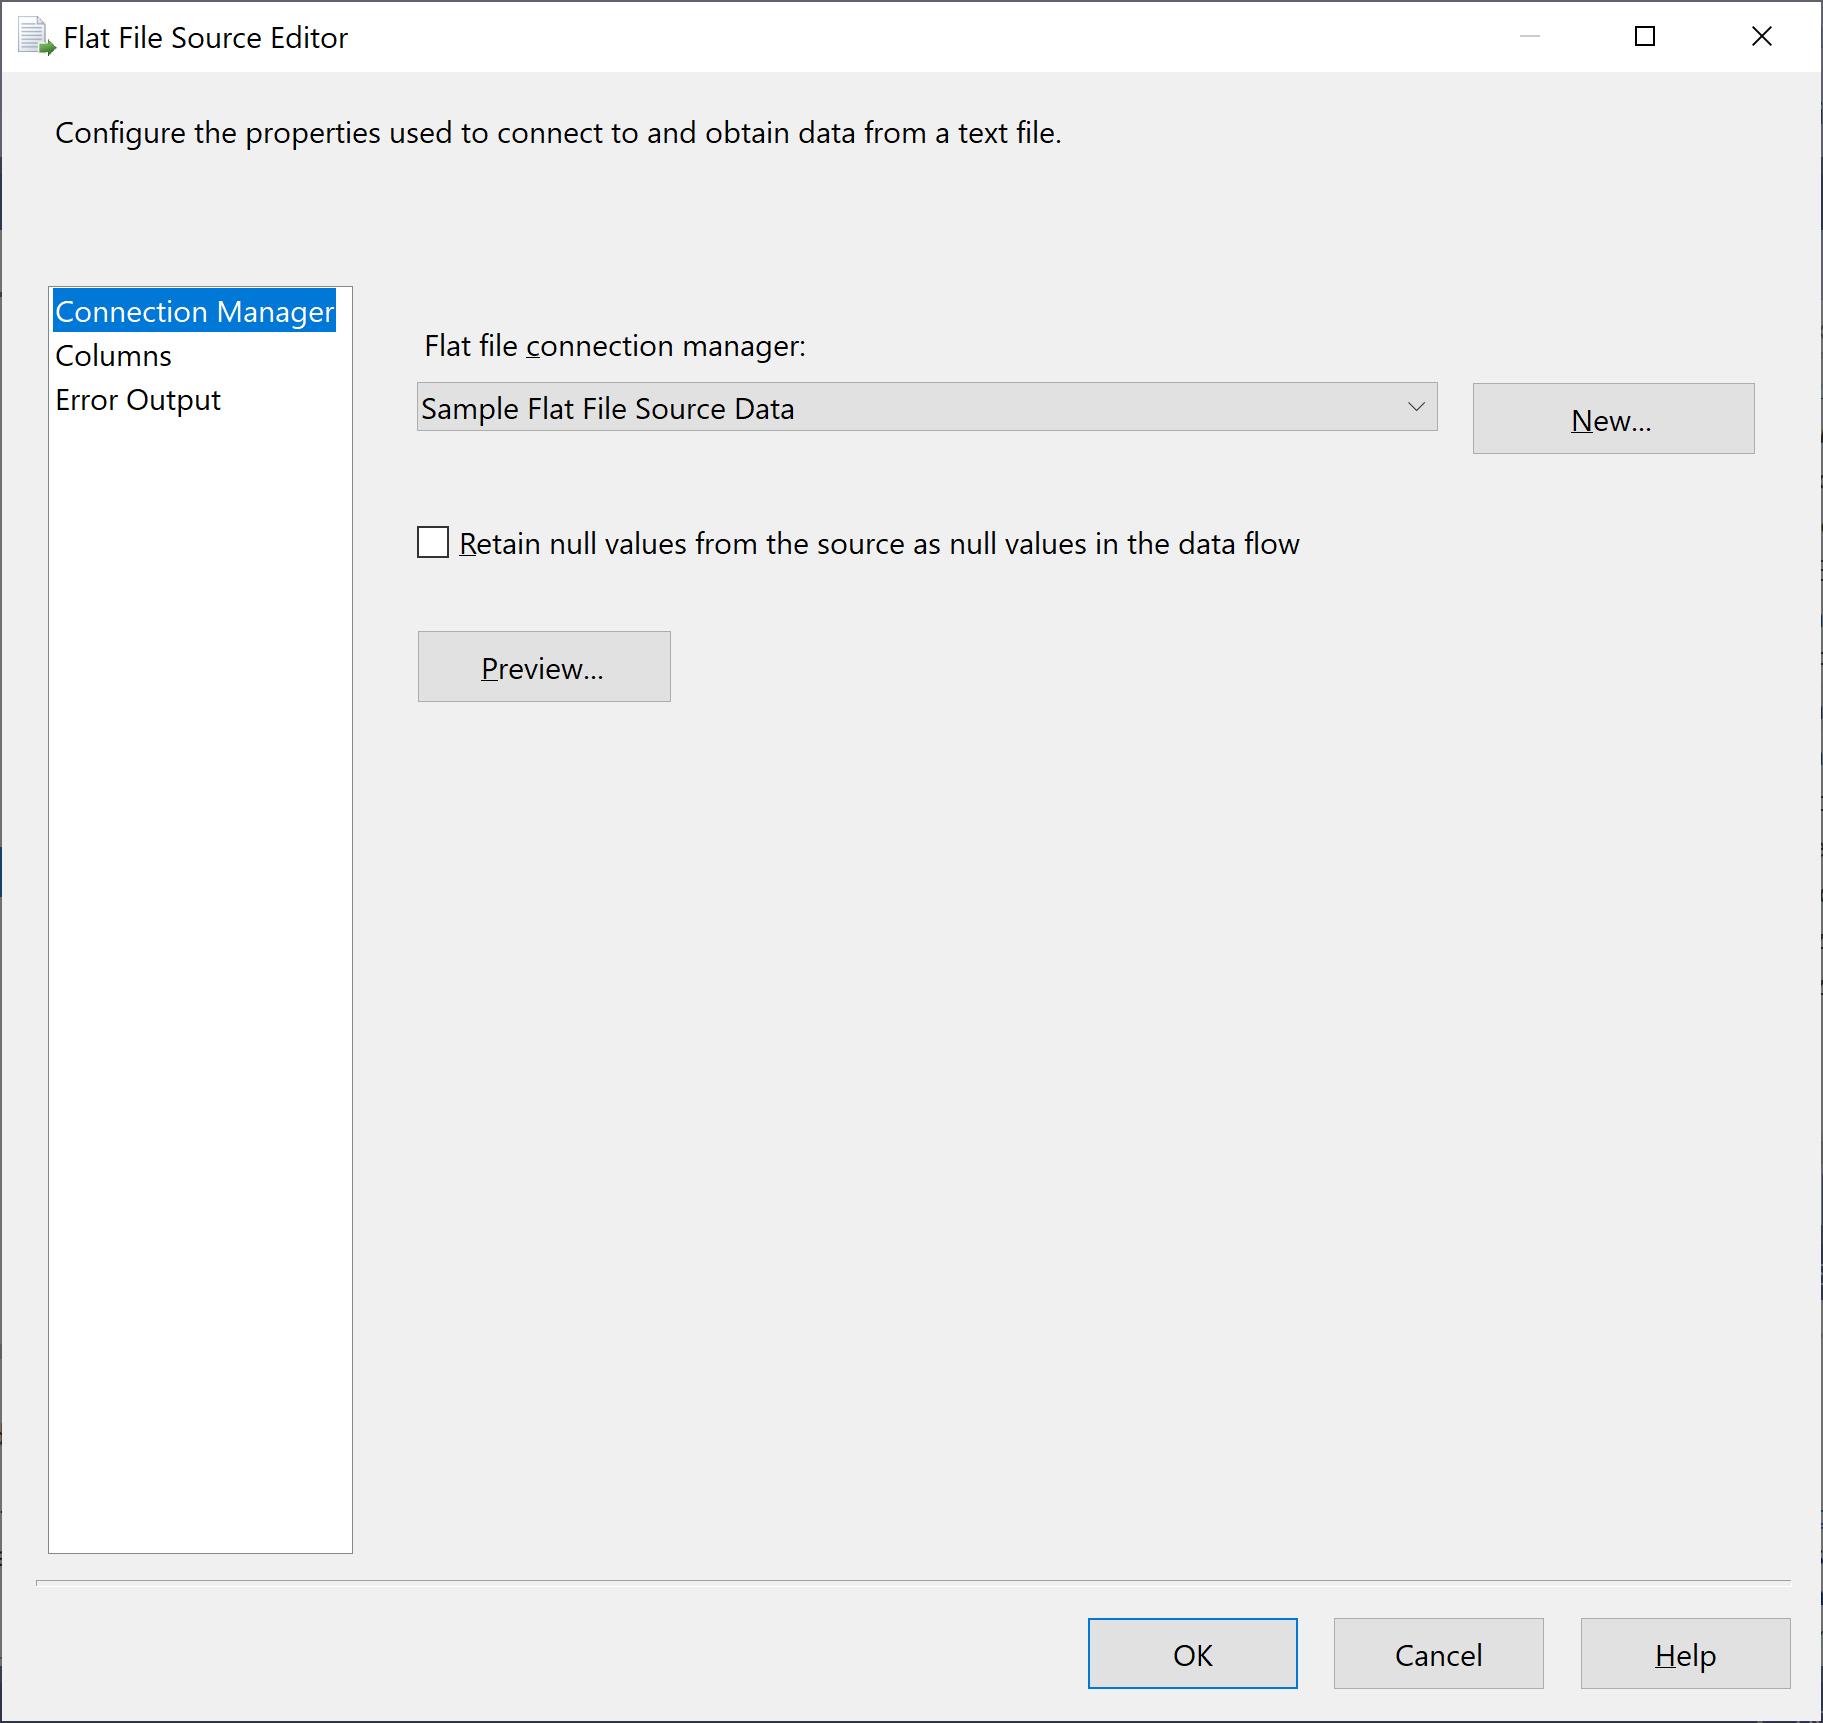 Sample Flat File Source Data